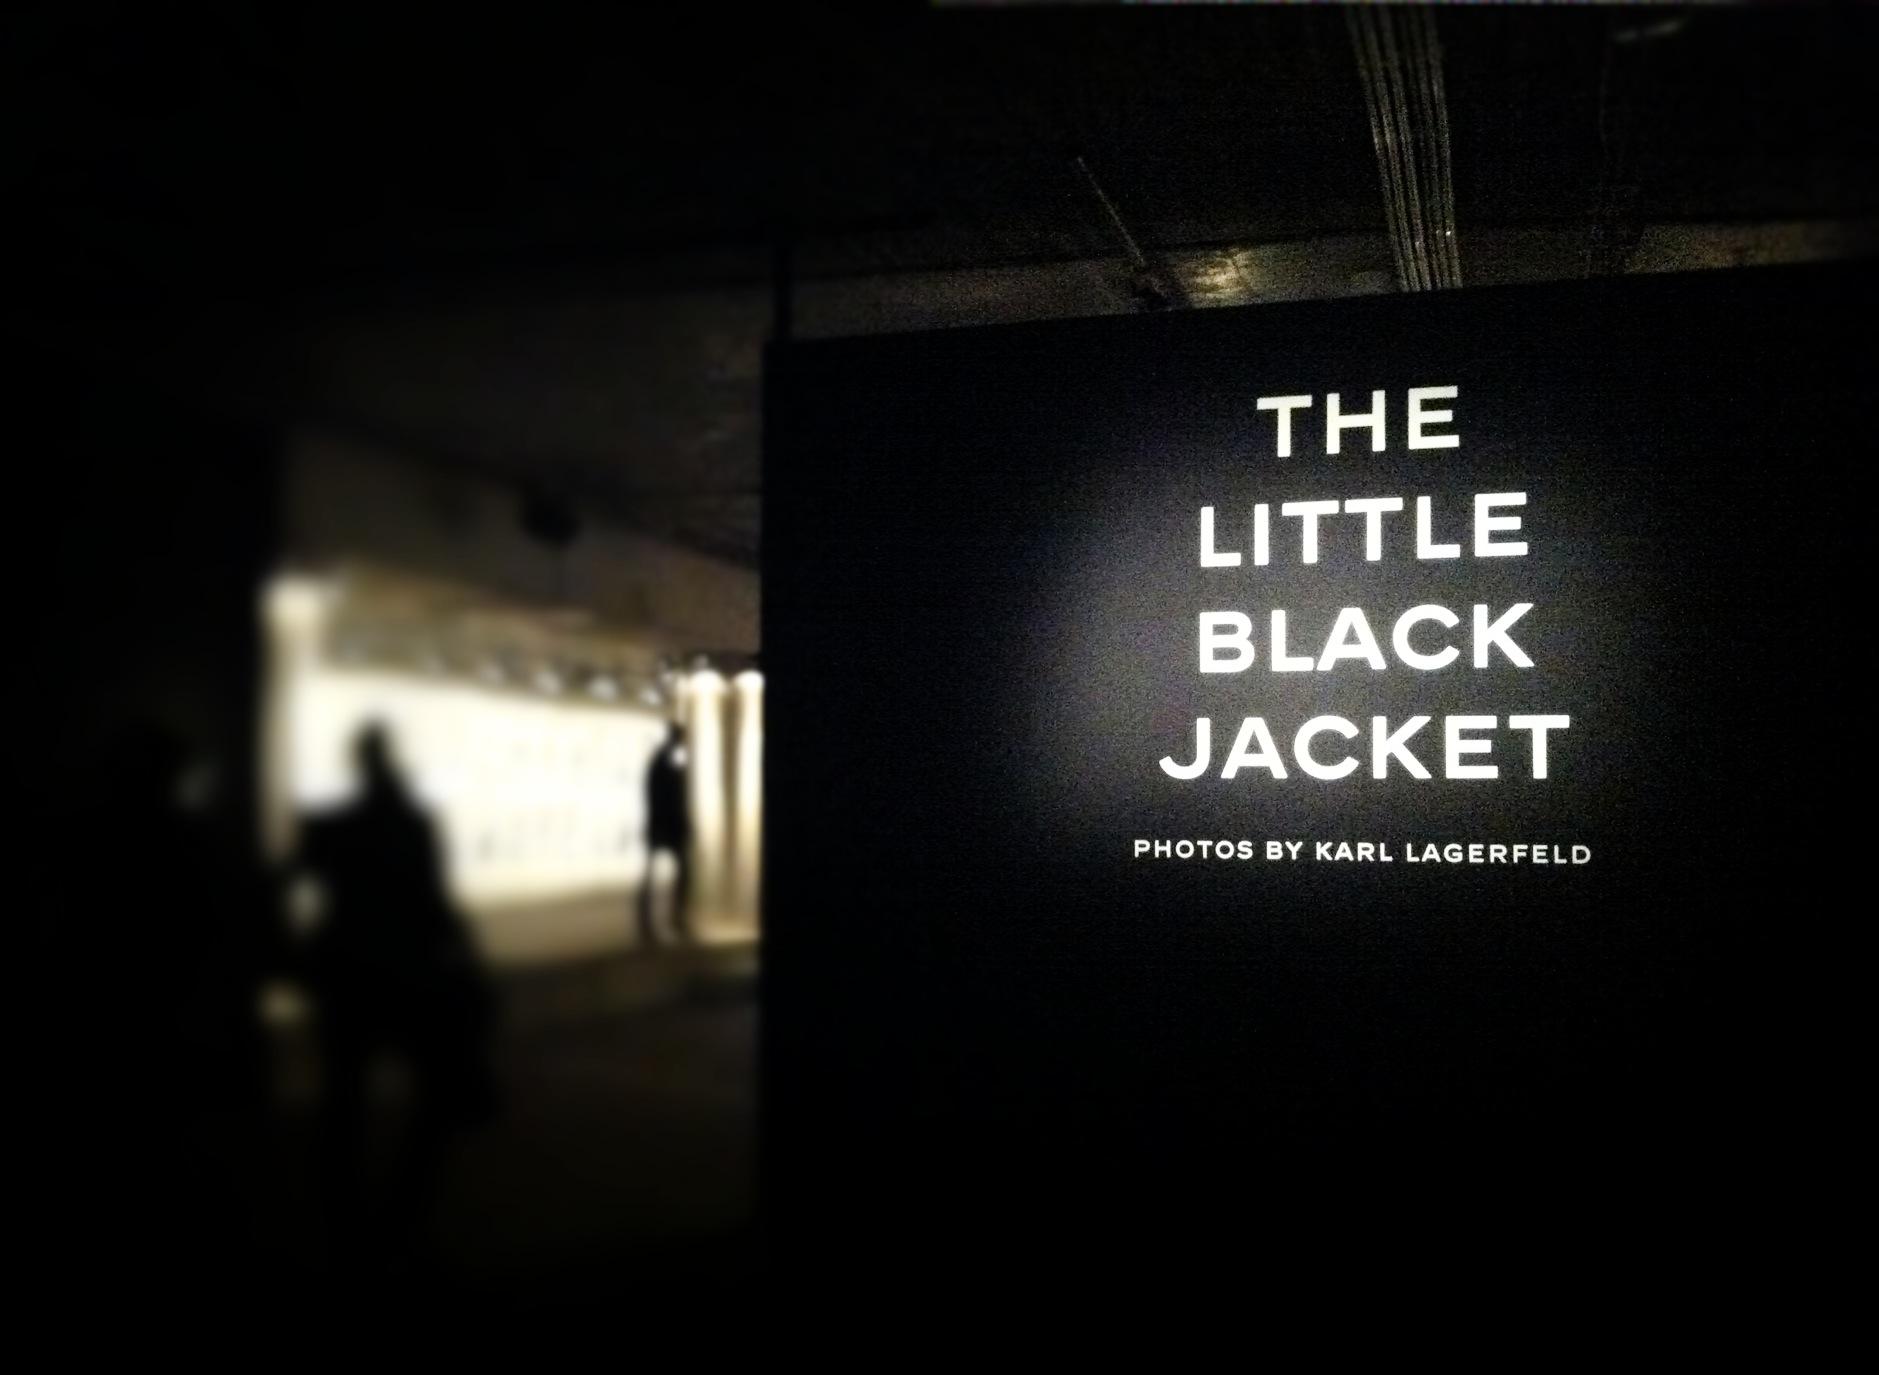 Chanel Berlin chanel the black jacket berlin entrance curating